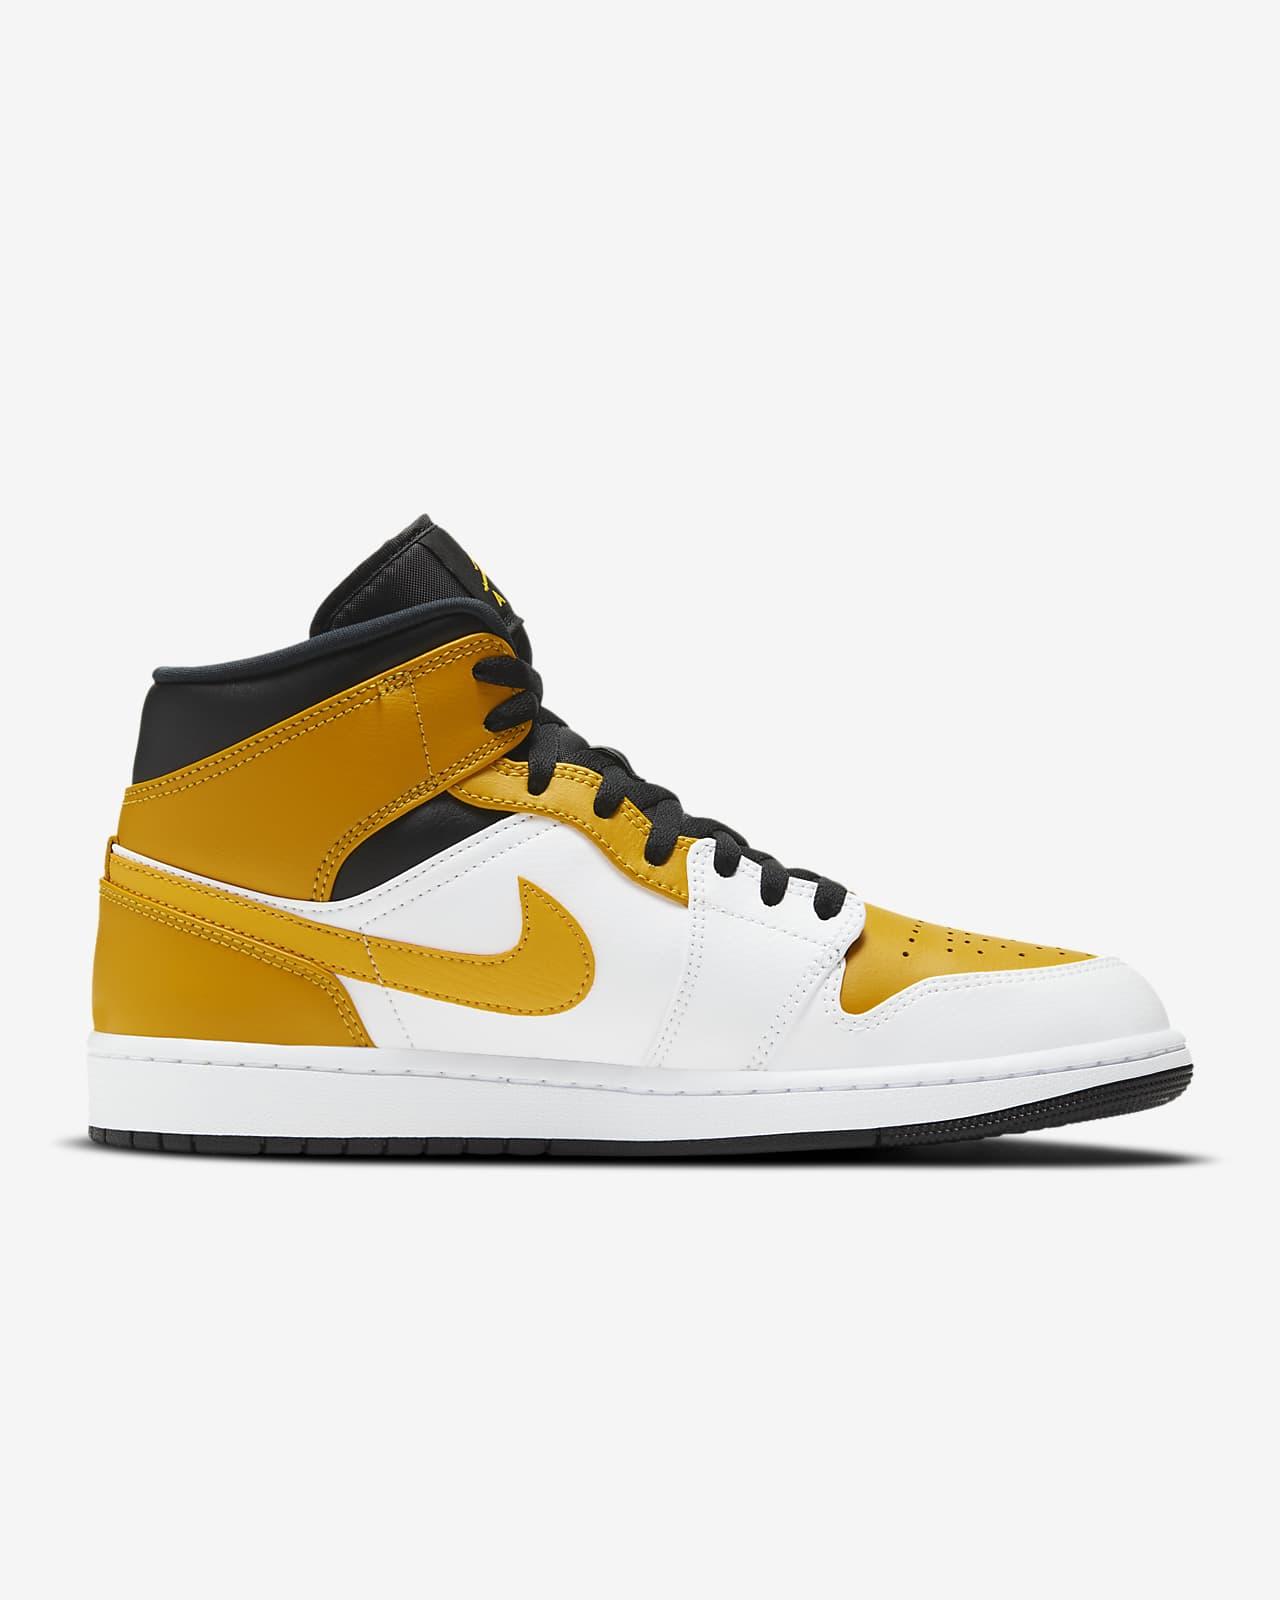 giay-sneaker-nu-nike-jordan-1-mid-gs-554725-170-university-gold-hang-chinh-hang